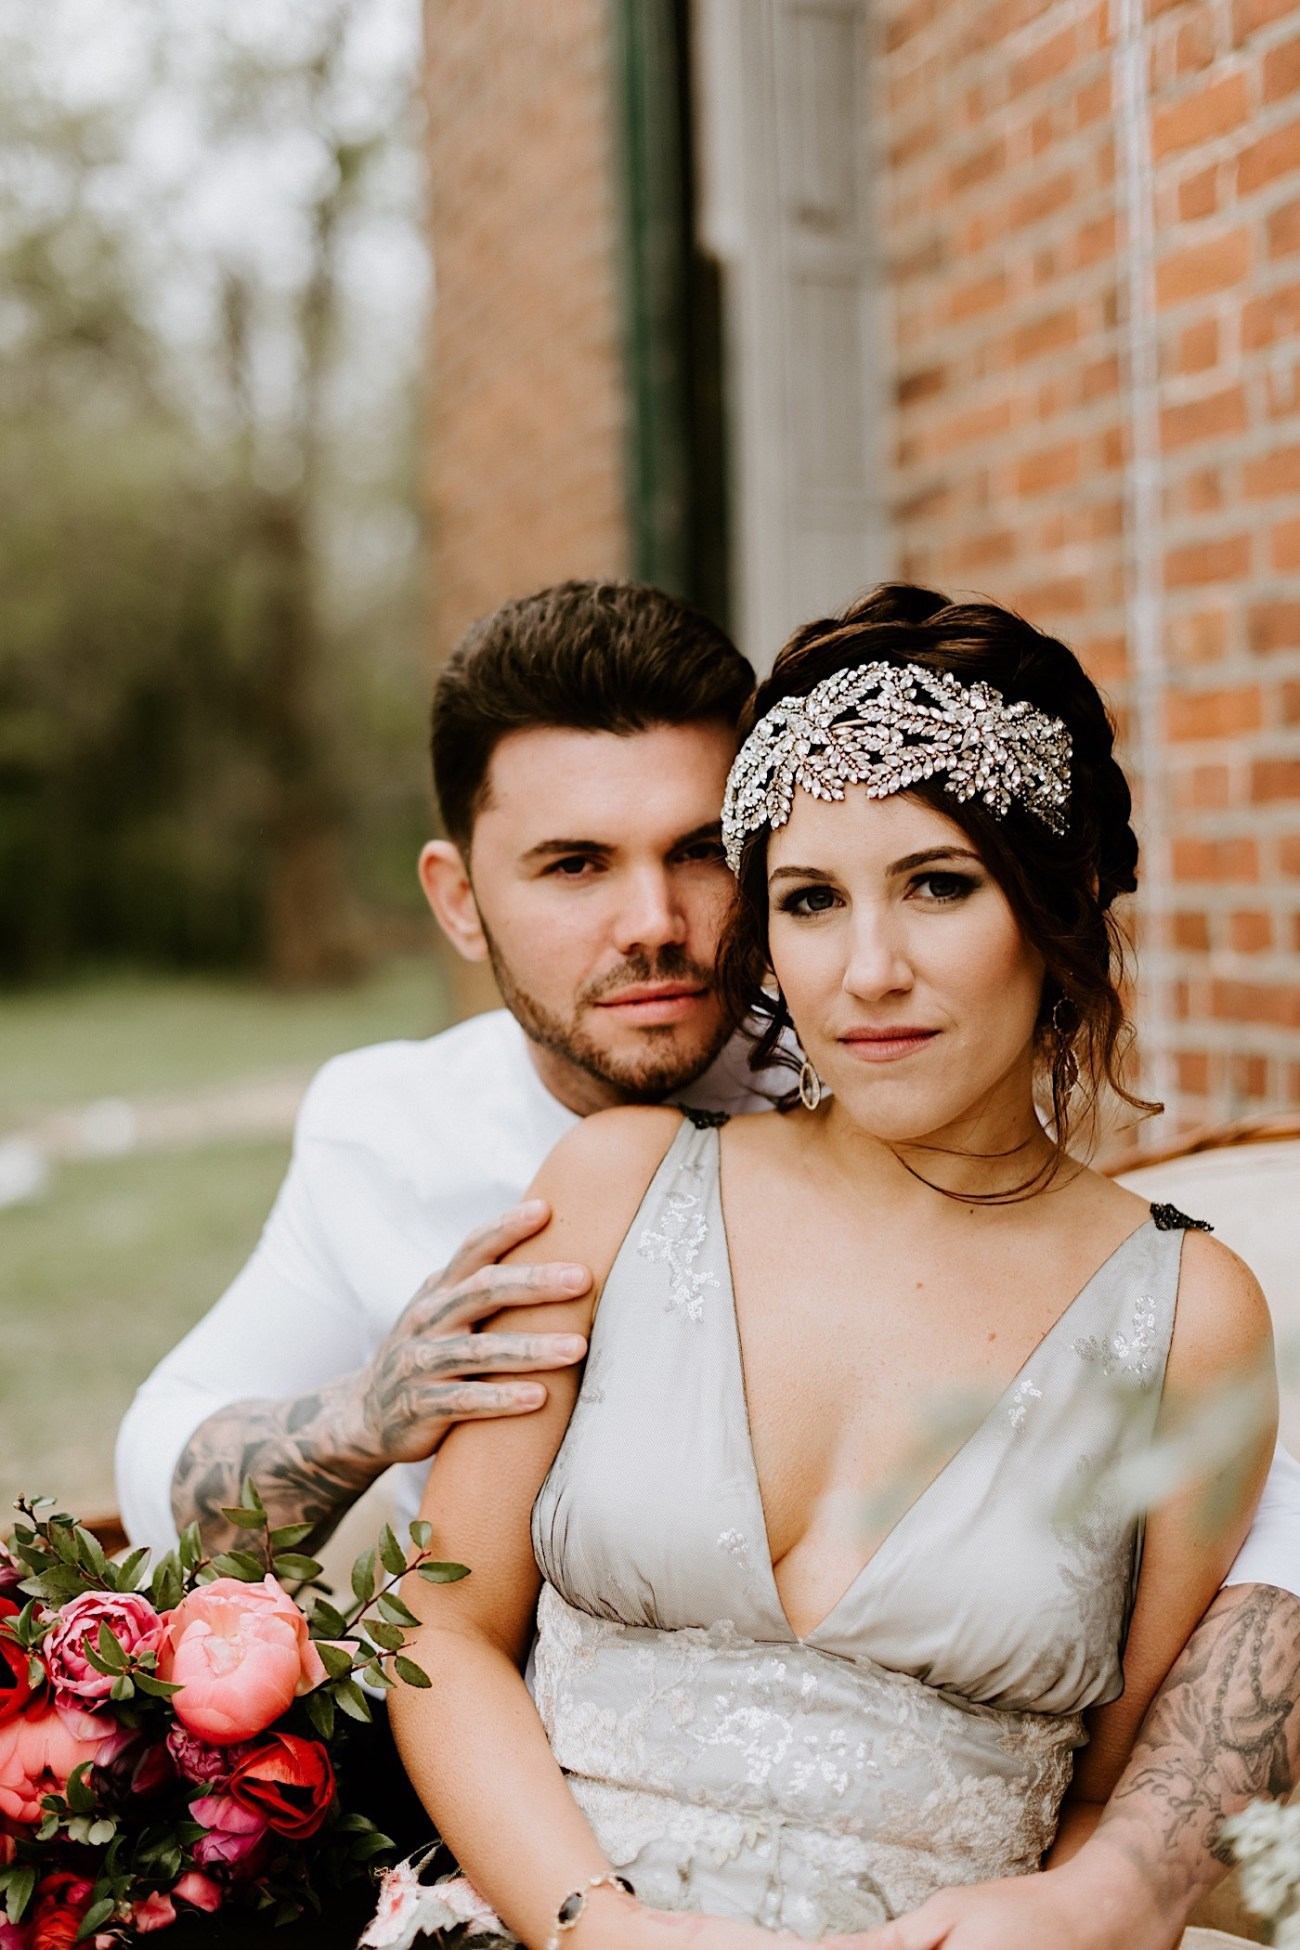 Romantic Phildalephia Wedding Photographer Philadelphia Wedding Venue Barnsley Manor Wedding 56